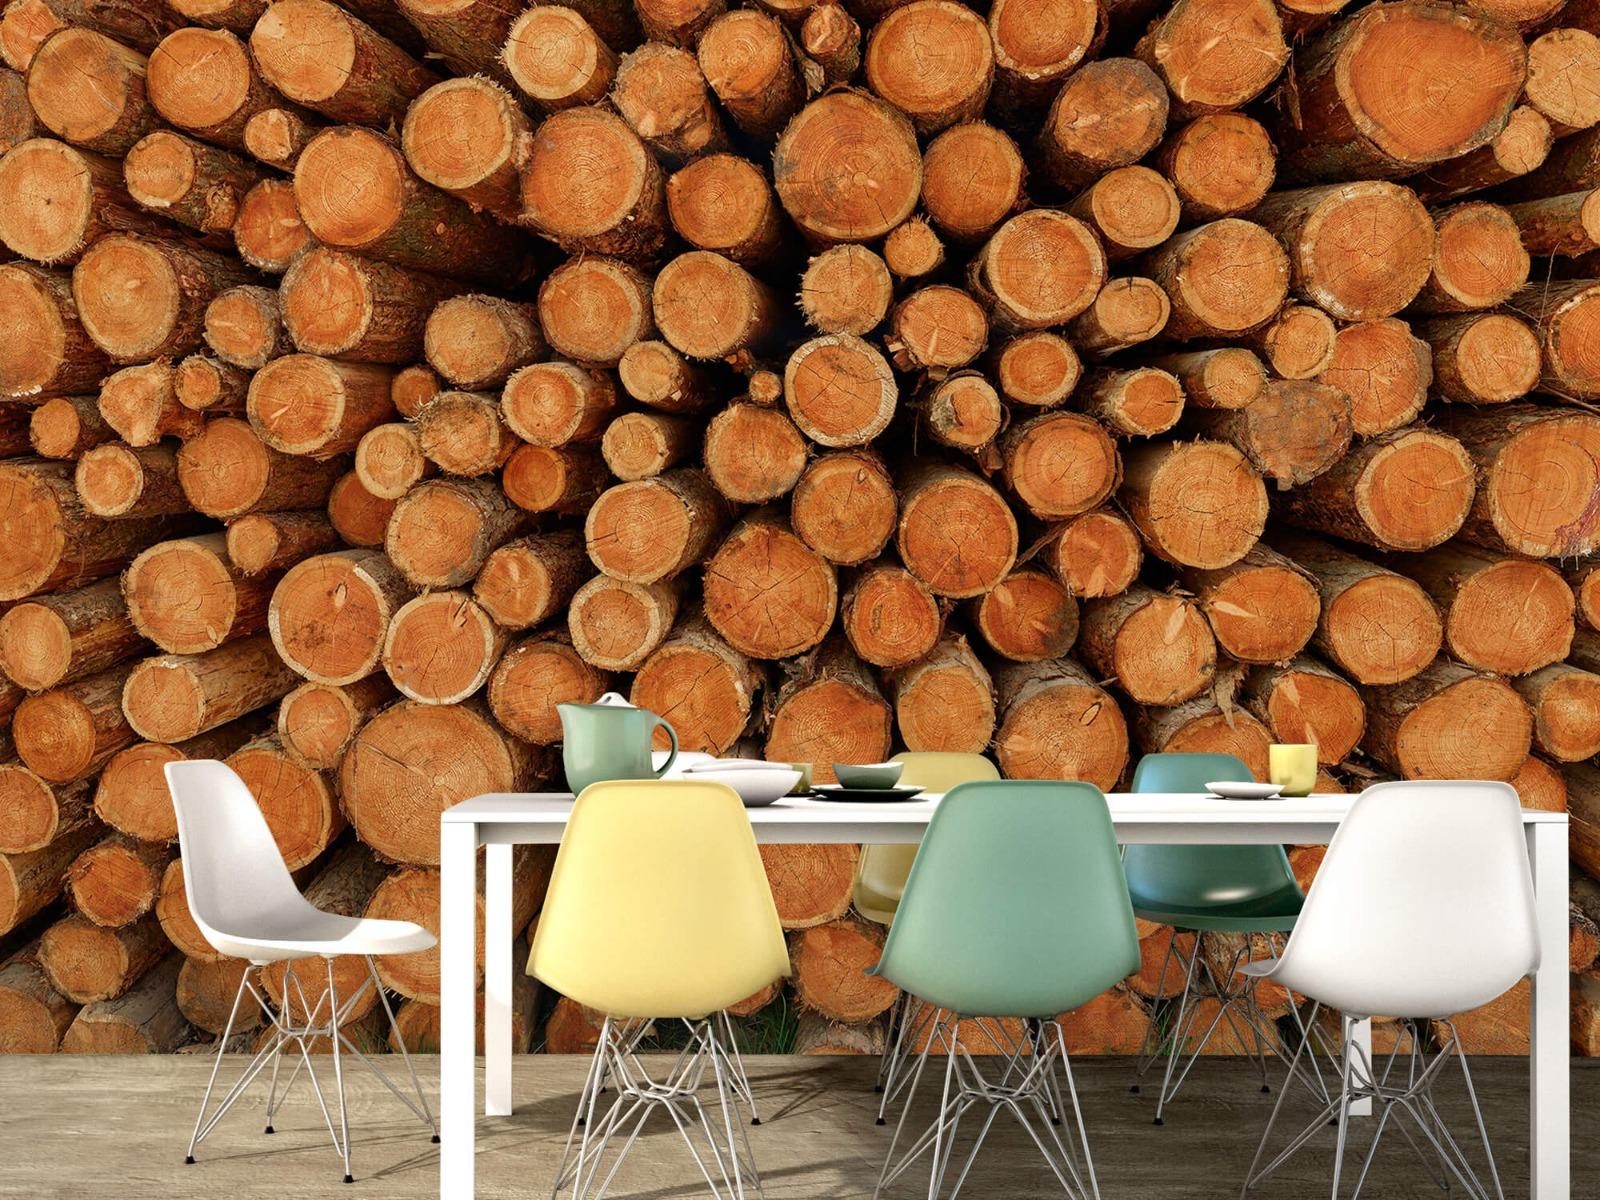 Bomen - Stapel donkere boomstammen - Slaapkamer 15